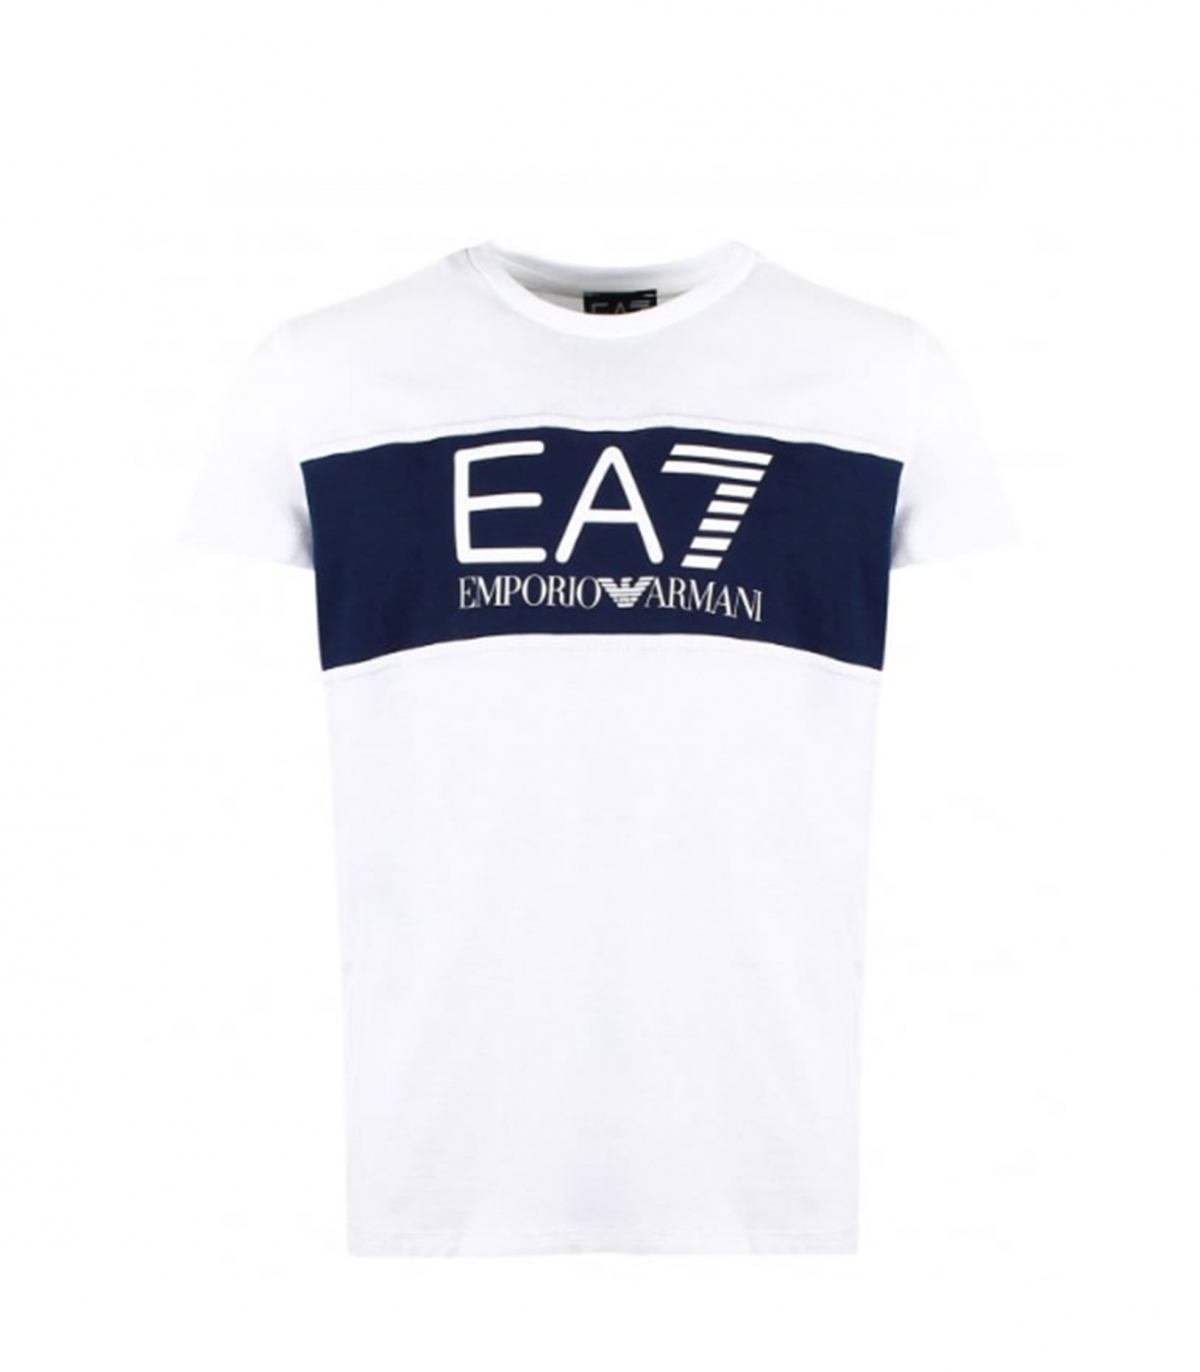 fbec0b5241975 Comprar Camiseta Emporio Armani